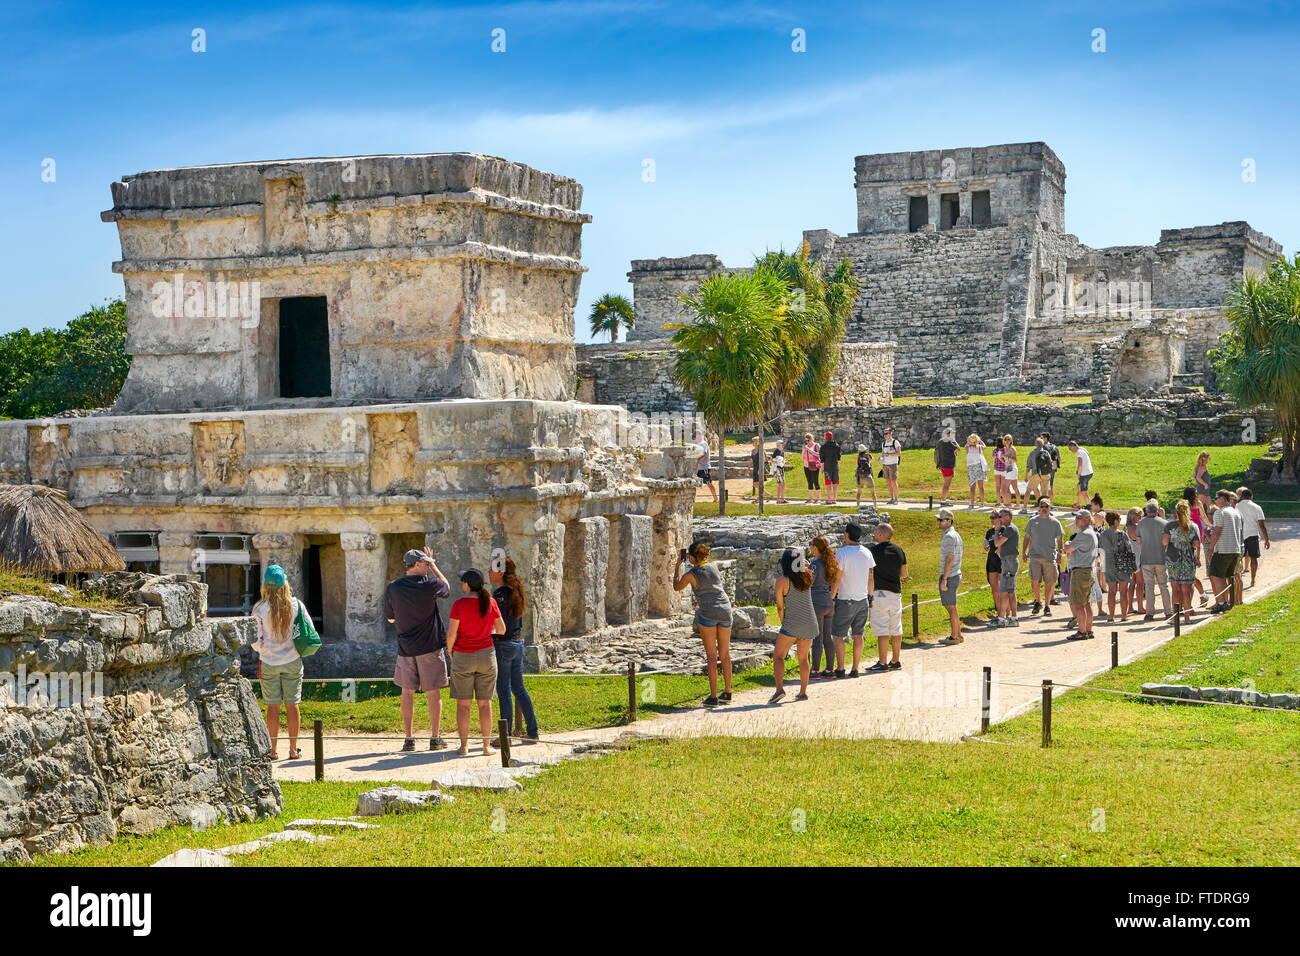 Ancient Maya Ruins, Tulum, Yucatan Peninsula, Mexico - Stock Image